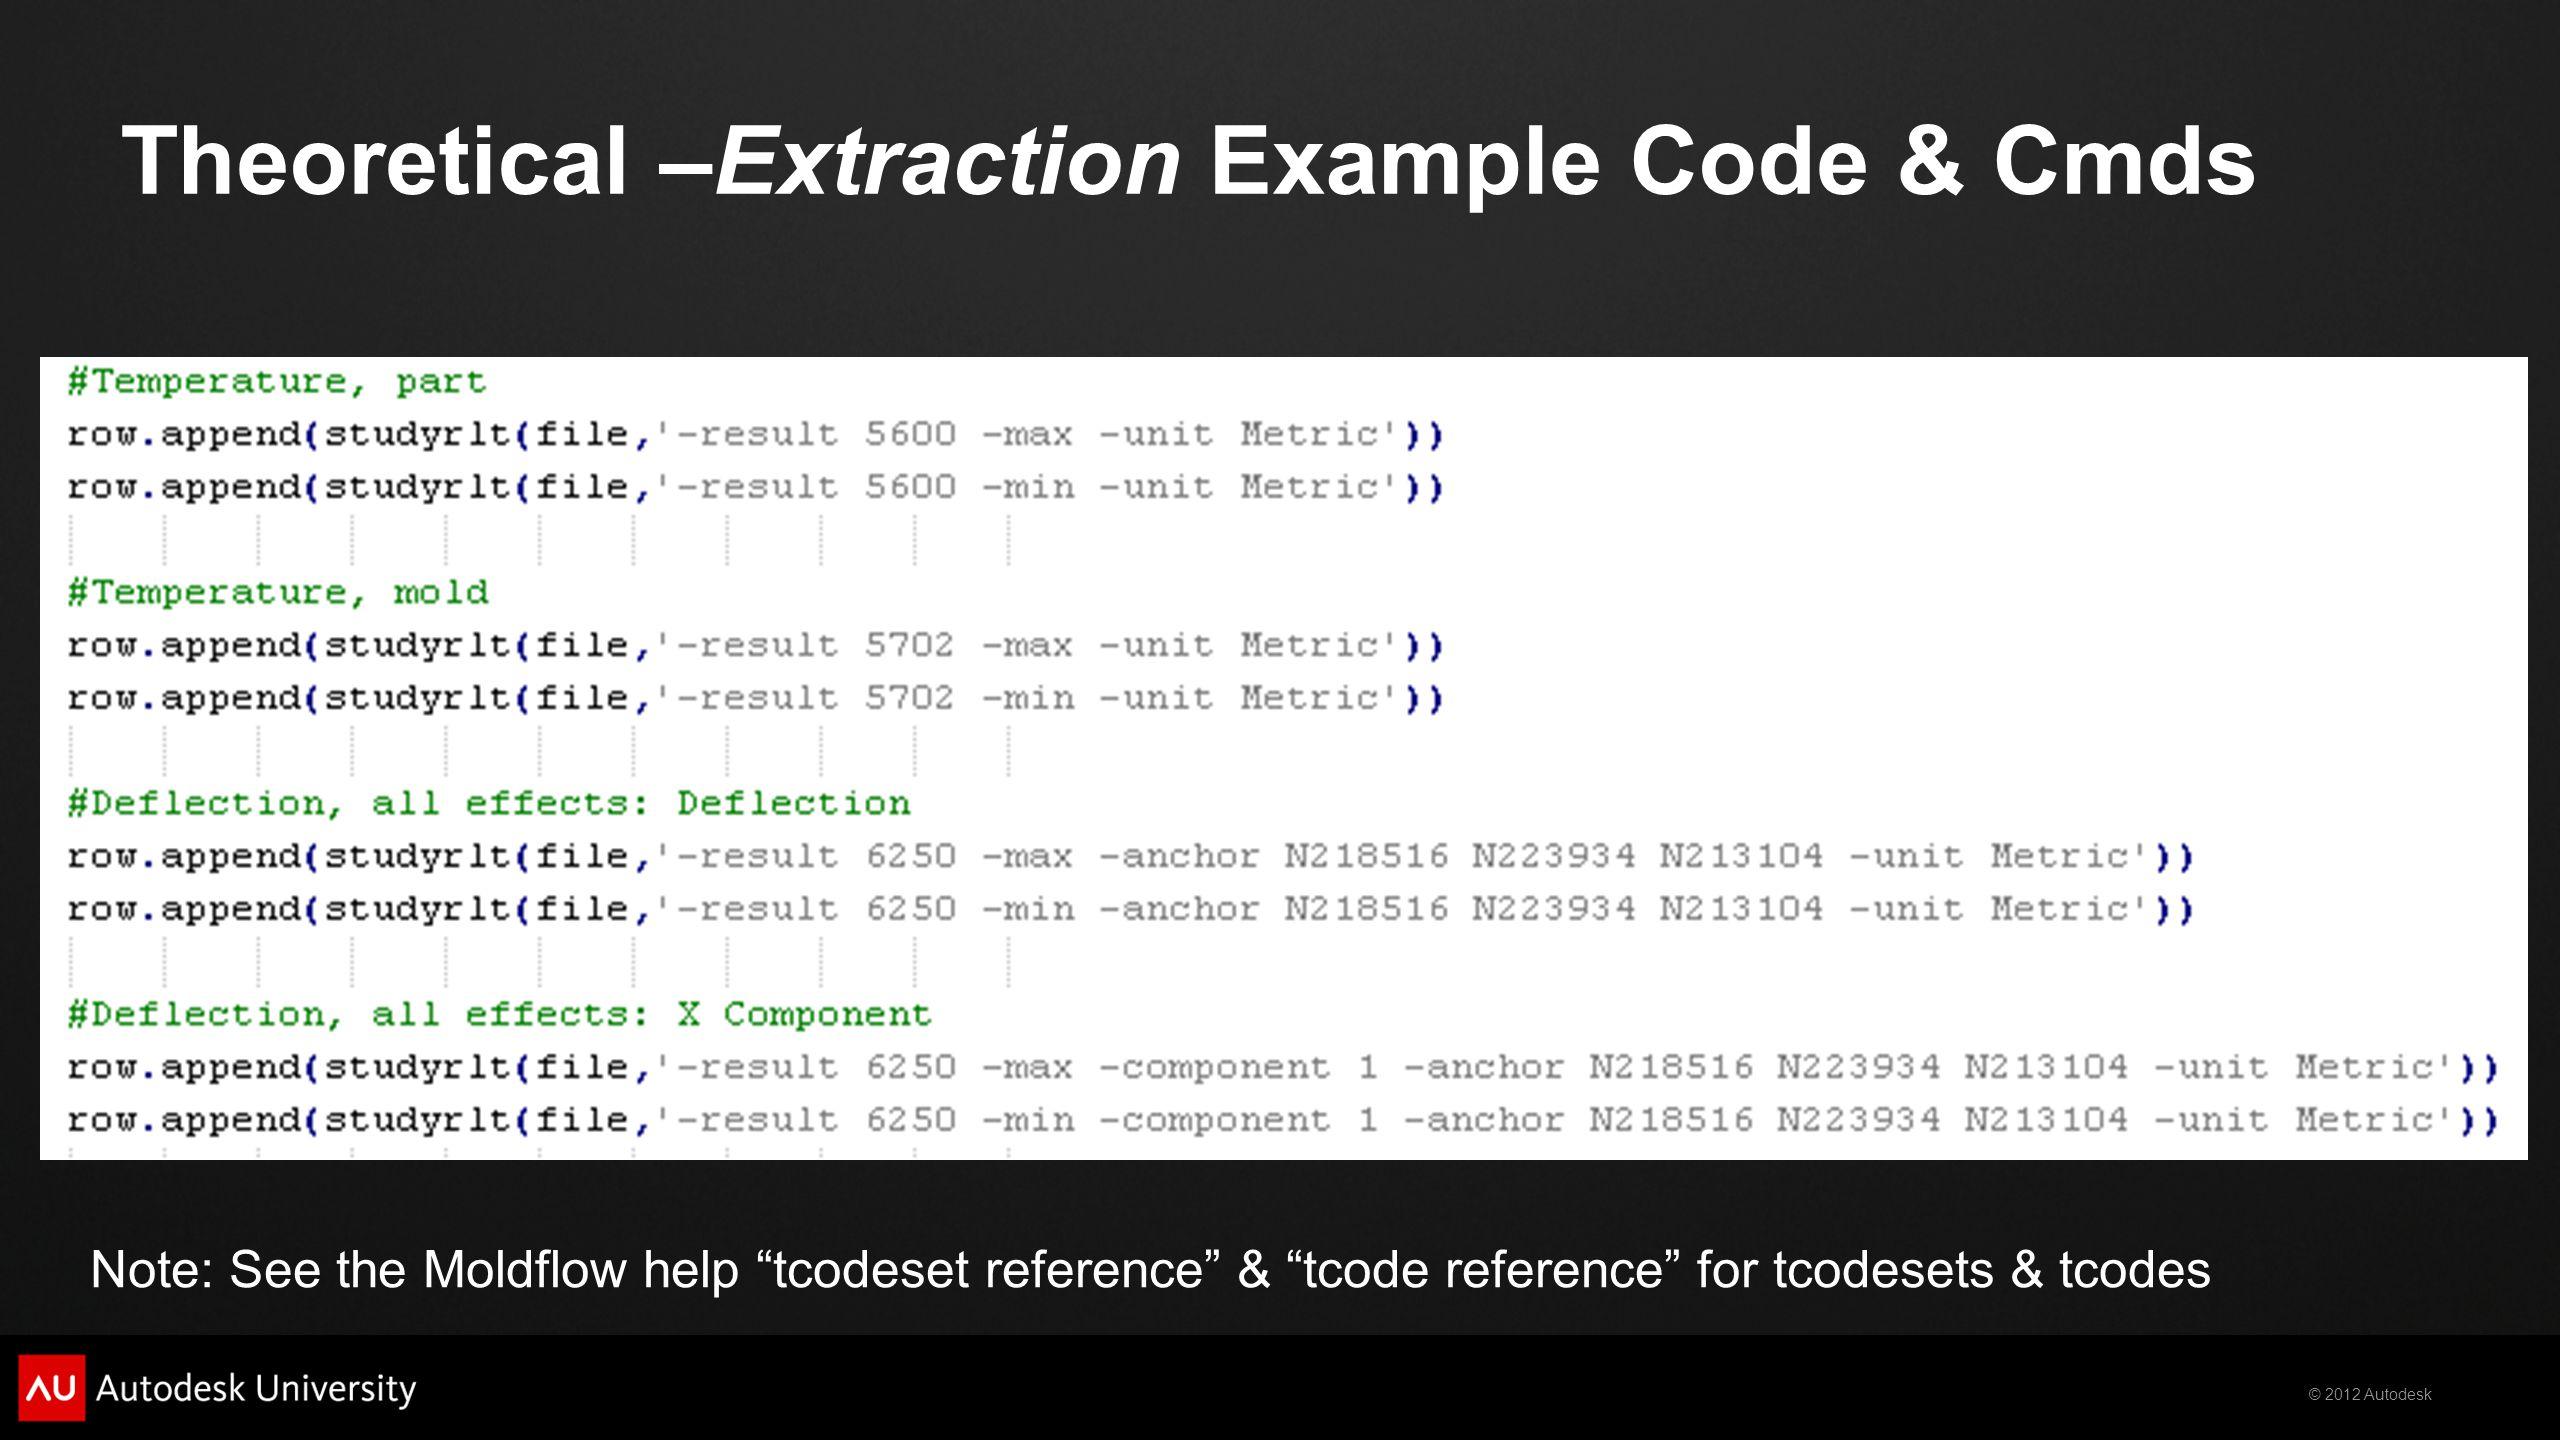 Theoretical –Extraction Example Code & Cmds